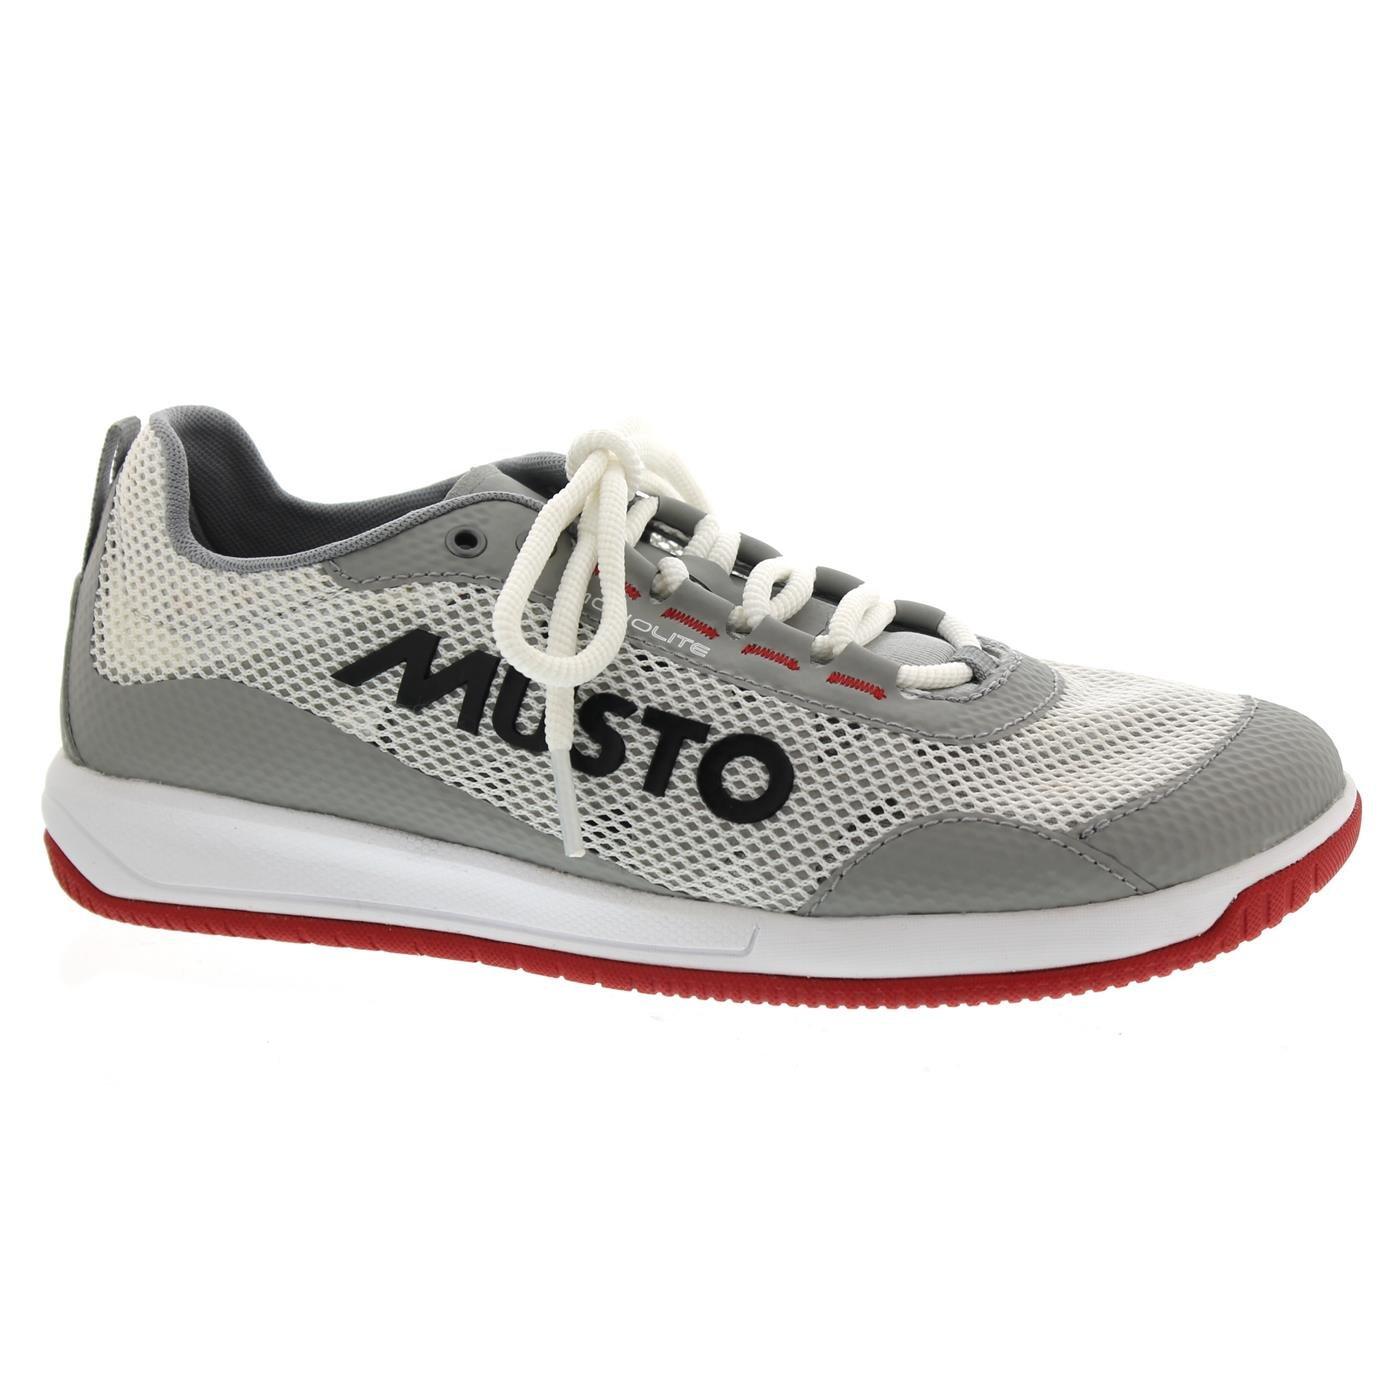 Musto Dynamic Pro Lite Sailing Shoes Pro – プラチナ Shoes Lite B07B8N3TKM UK Size 7, んまーいmon屋:02b5ee7b --- sharoshka.org